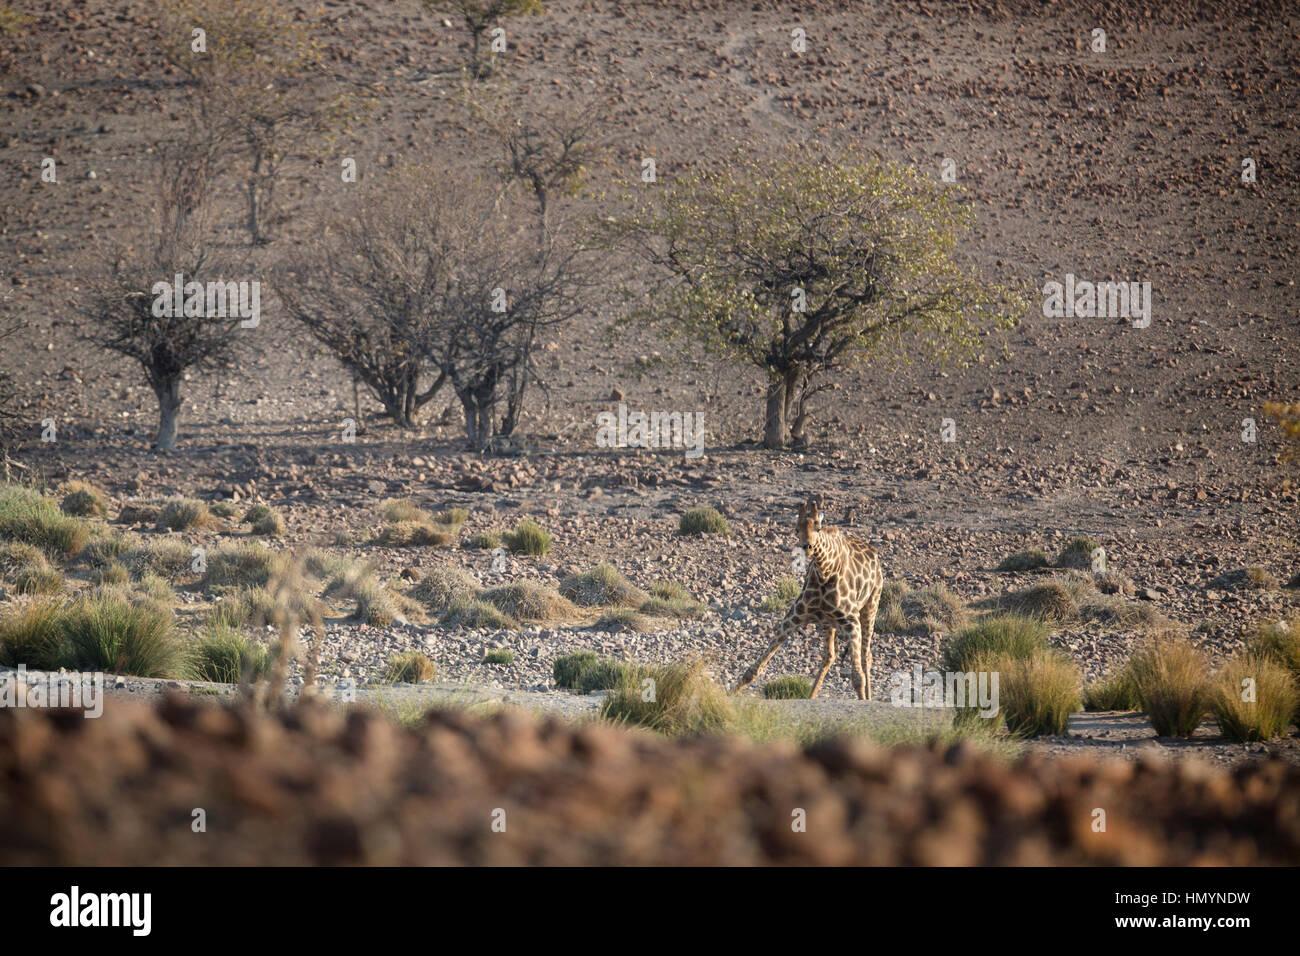 Giraffe in Palmwag concession, Namibia - Stock Image